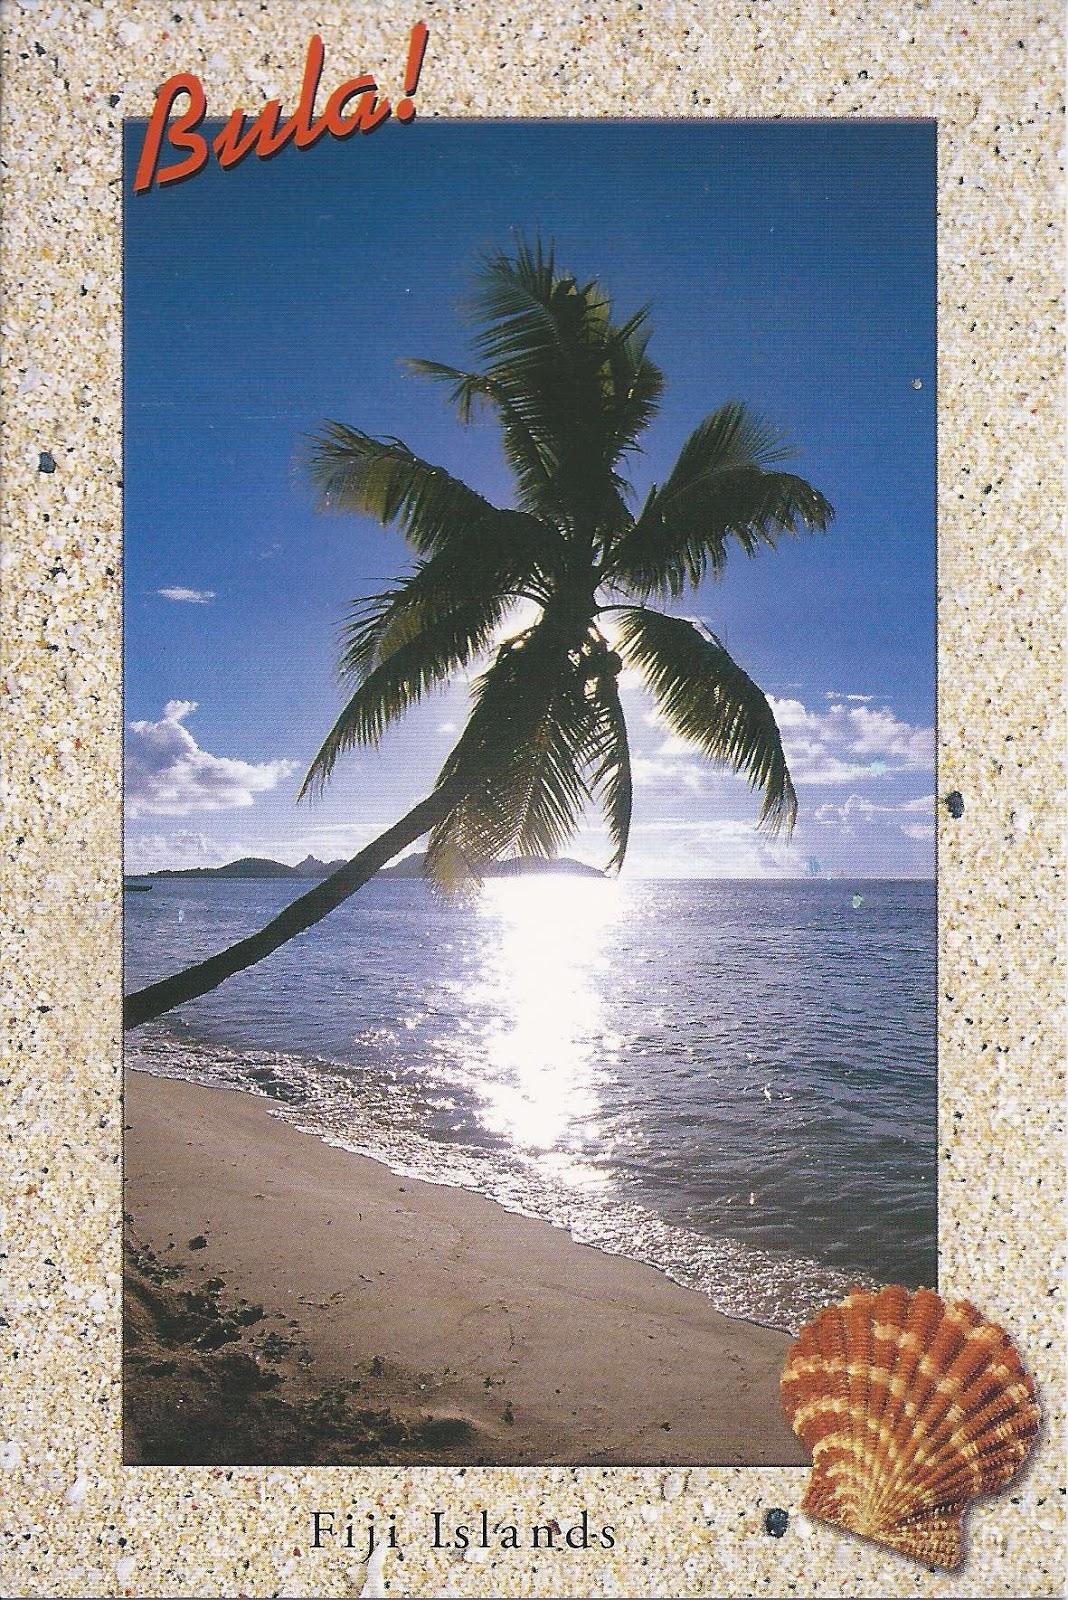 A Journey Of Postcards: Bula! From Fiji Islands